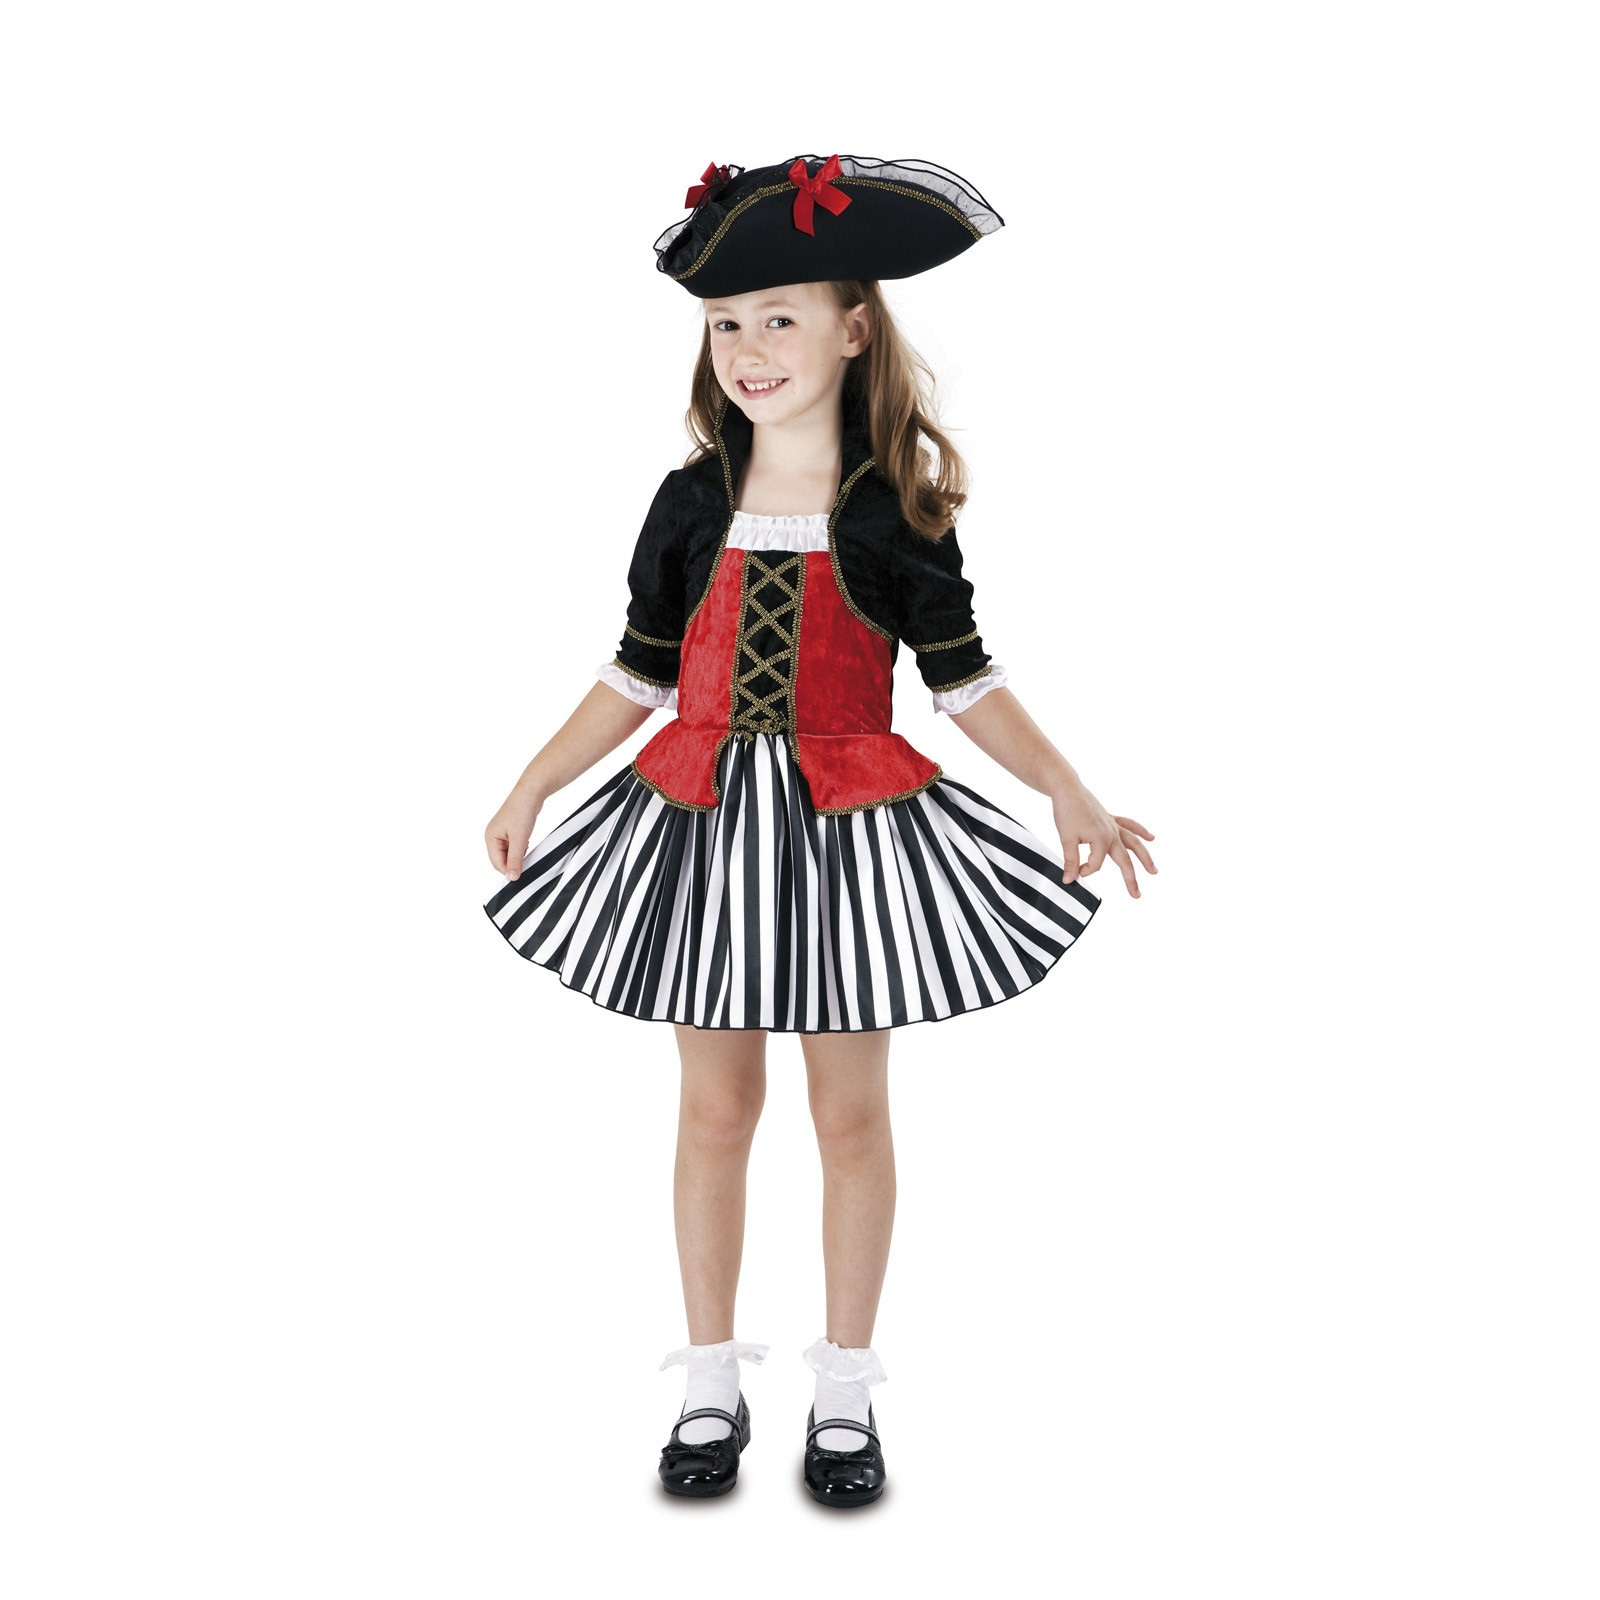 disfraz pirata anne niña 203149mom - DISFRAZ DE PIRATA ANNE NIÑA